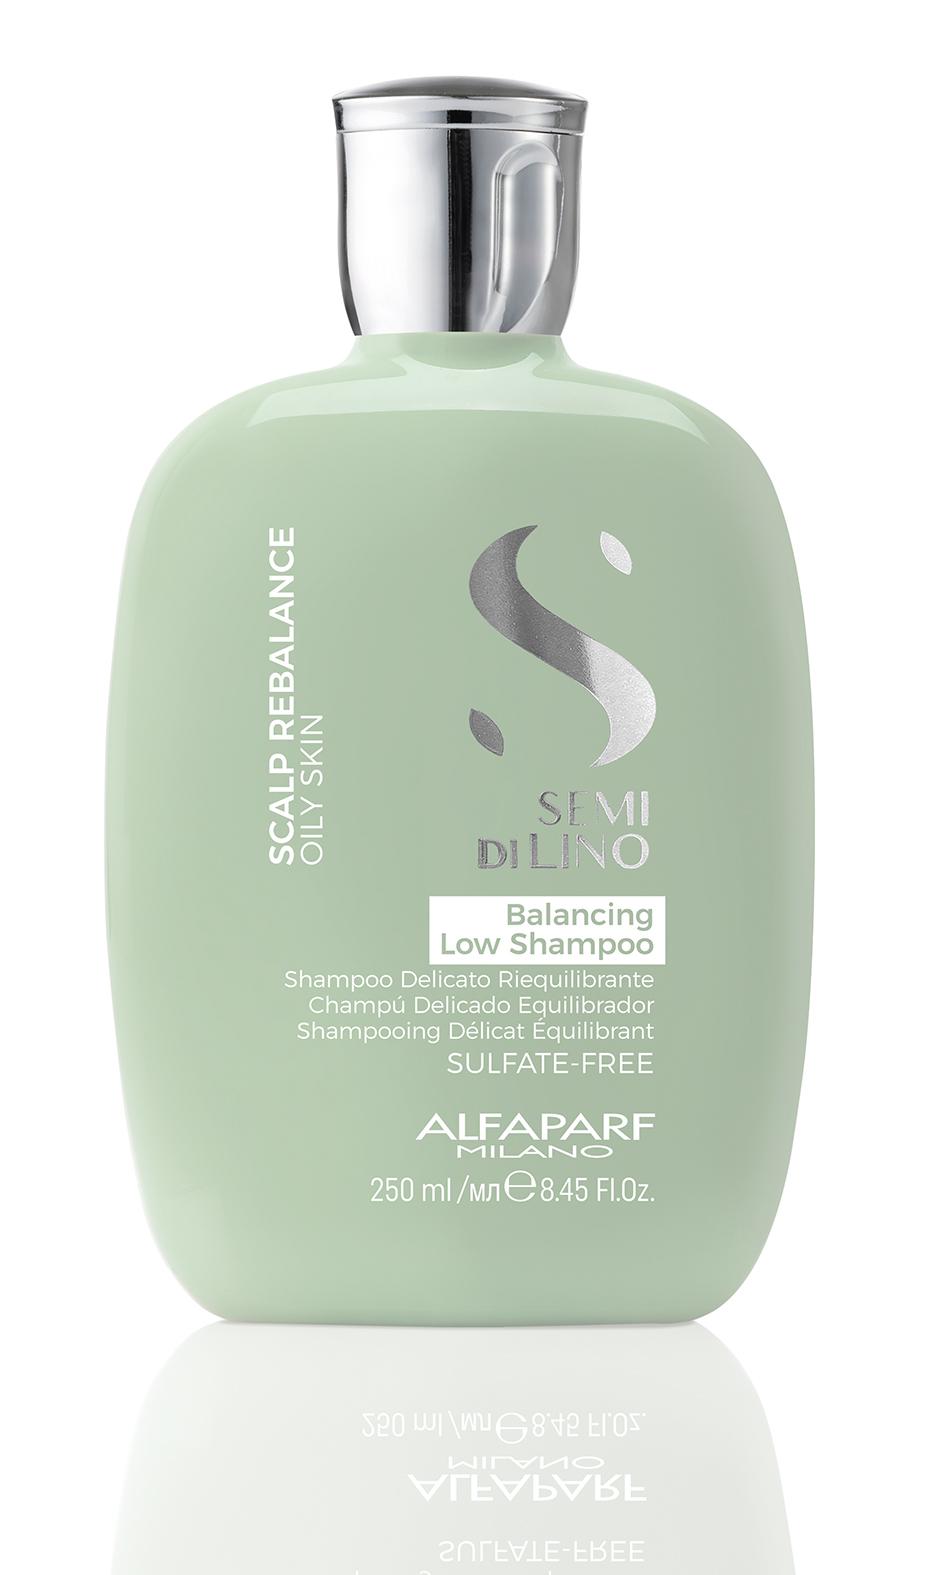 semi-di-lino-scalp-balancing-low-shampoo-pf019474-fla-250ml-nolev